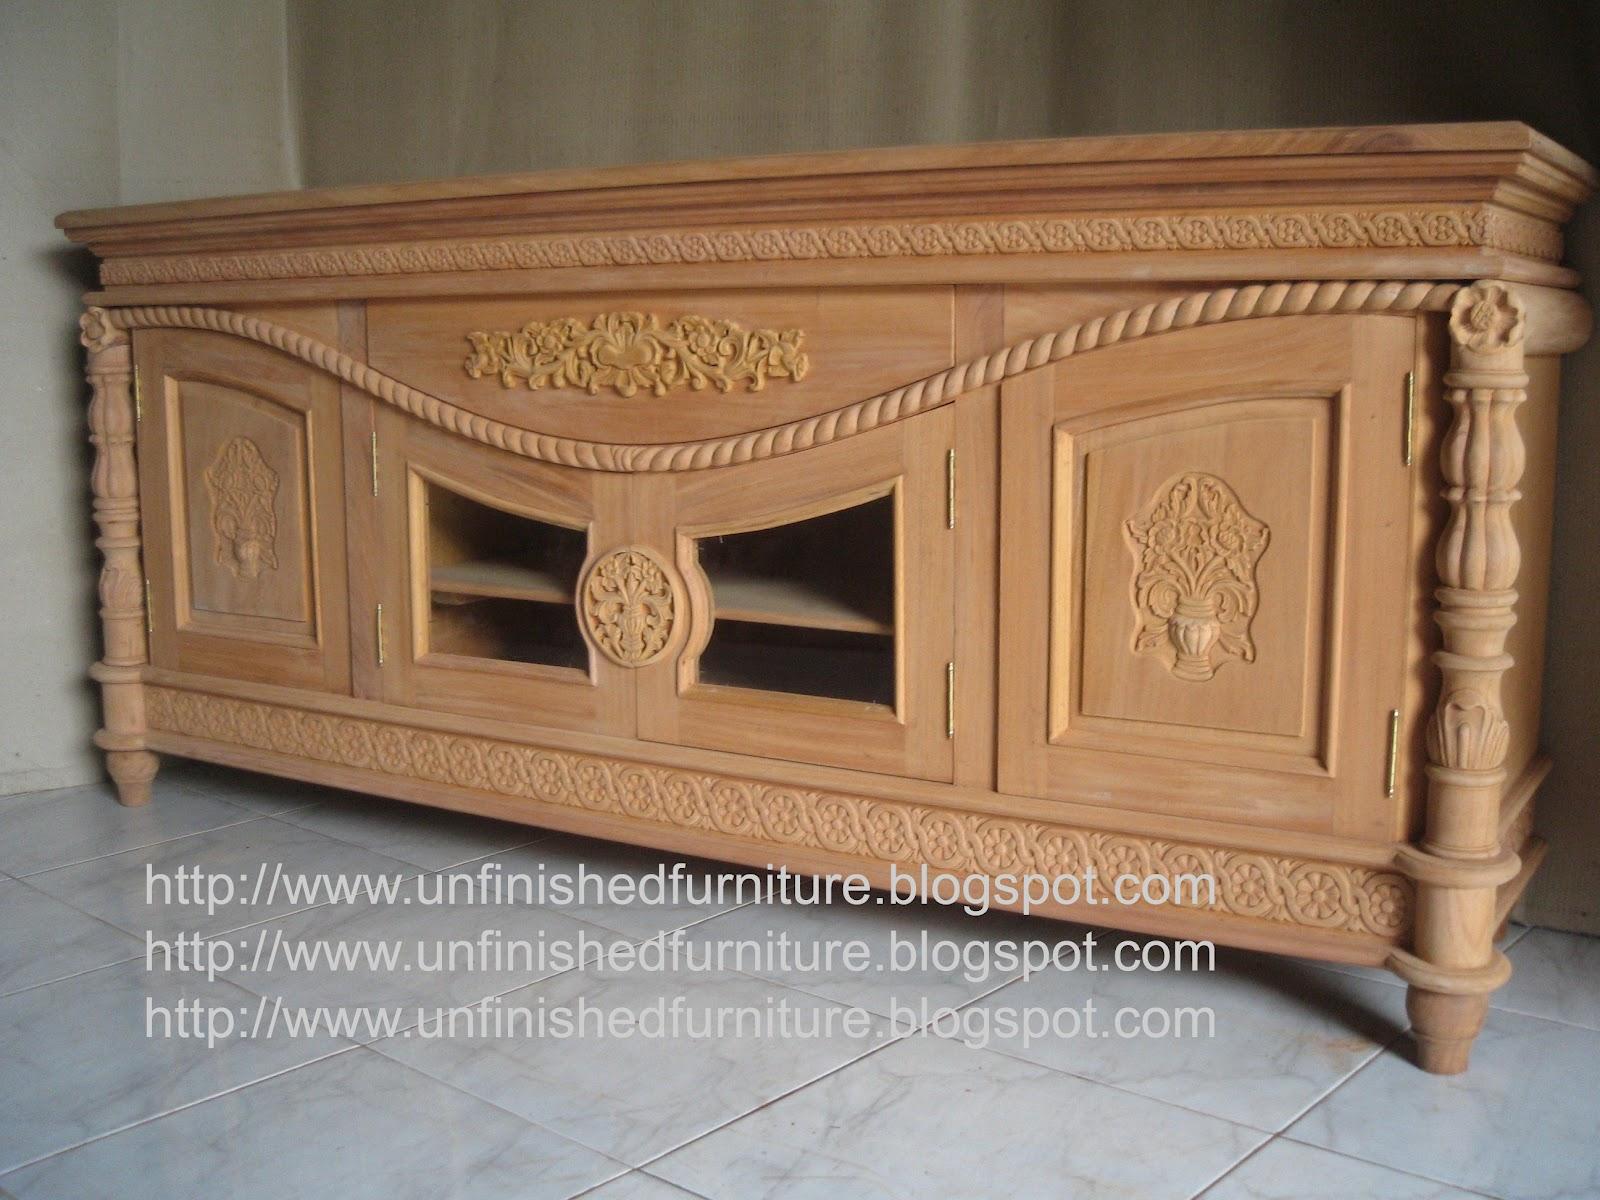 unfinished wooden chairs canada thomasville dining discontinued built in corner desk kitchen teilnehmer diy wood